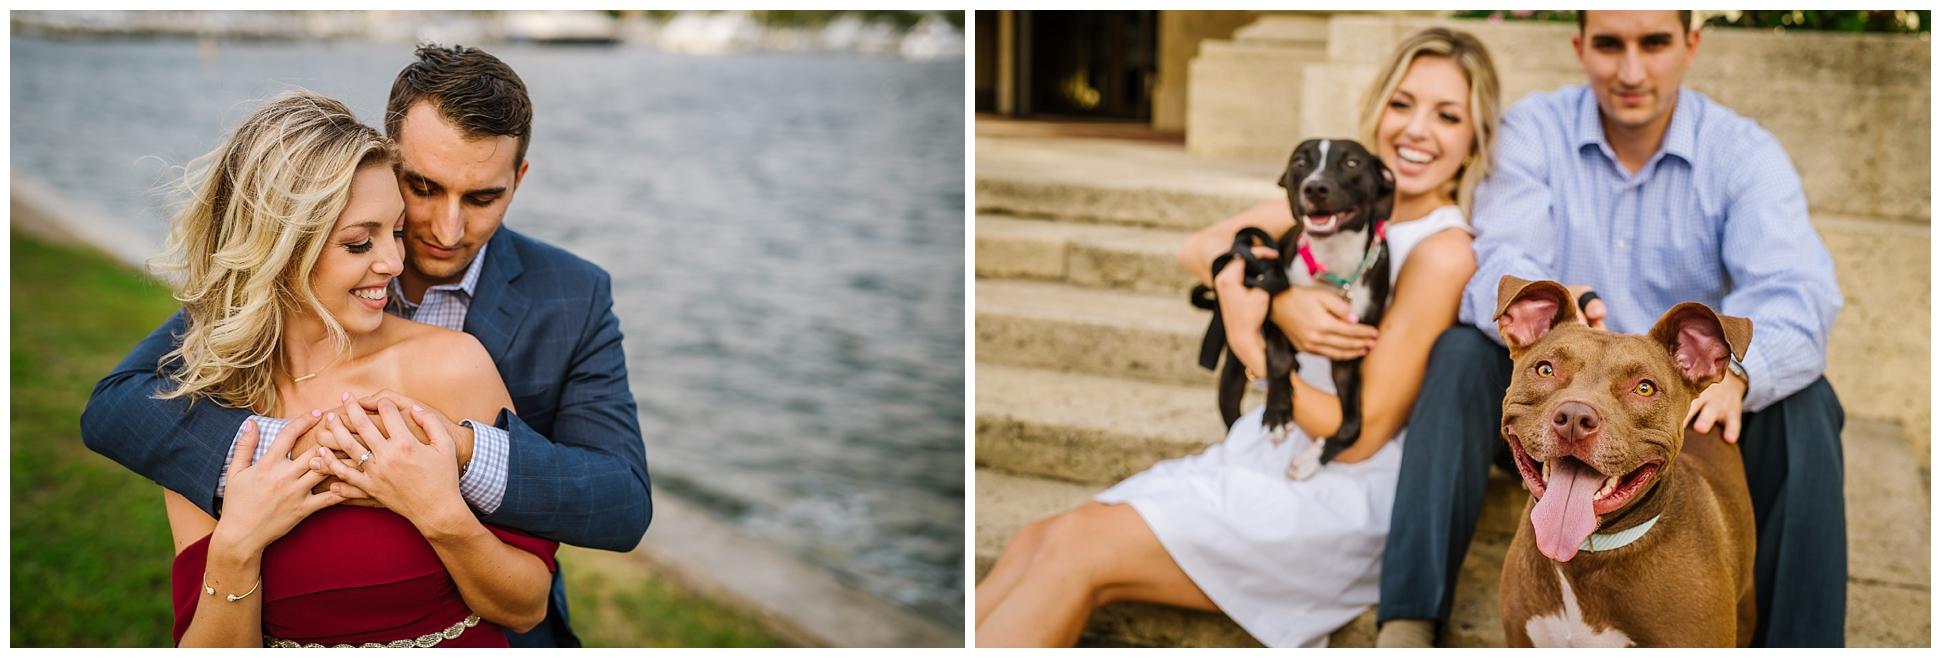 Ashlee-hamon-photography-year-in-review-2016-travel-wanderlust-vsco-adventure-wedding_0008.jpg